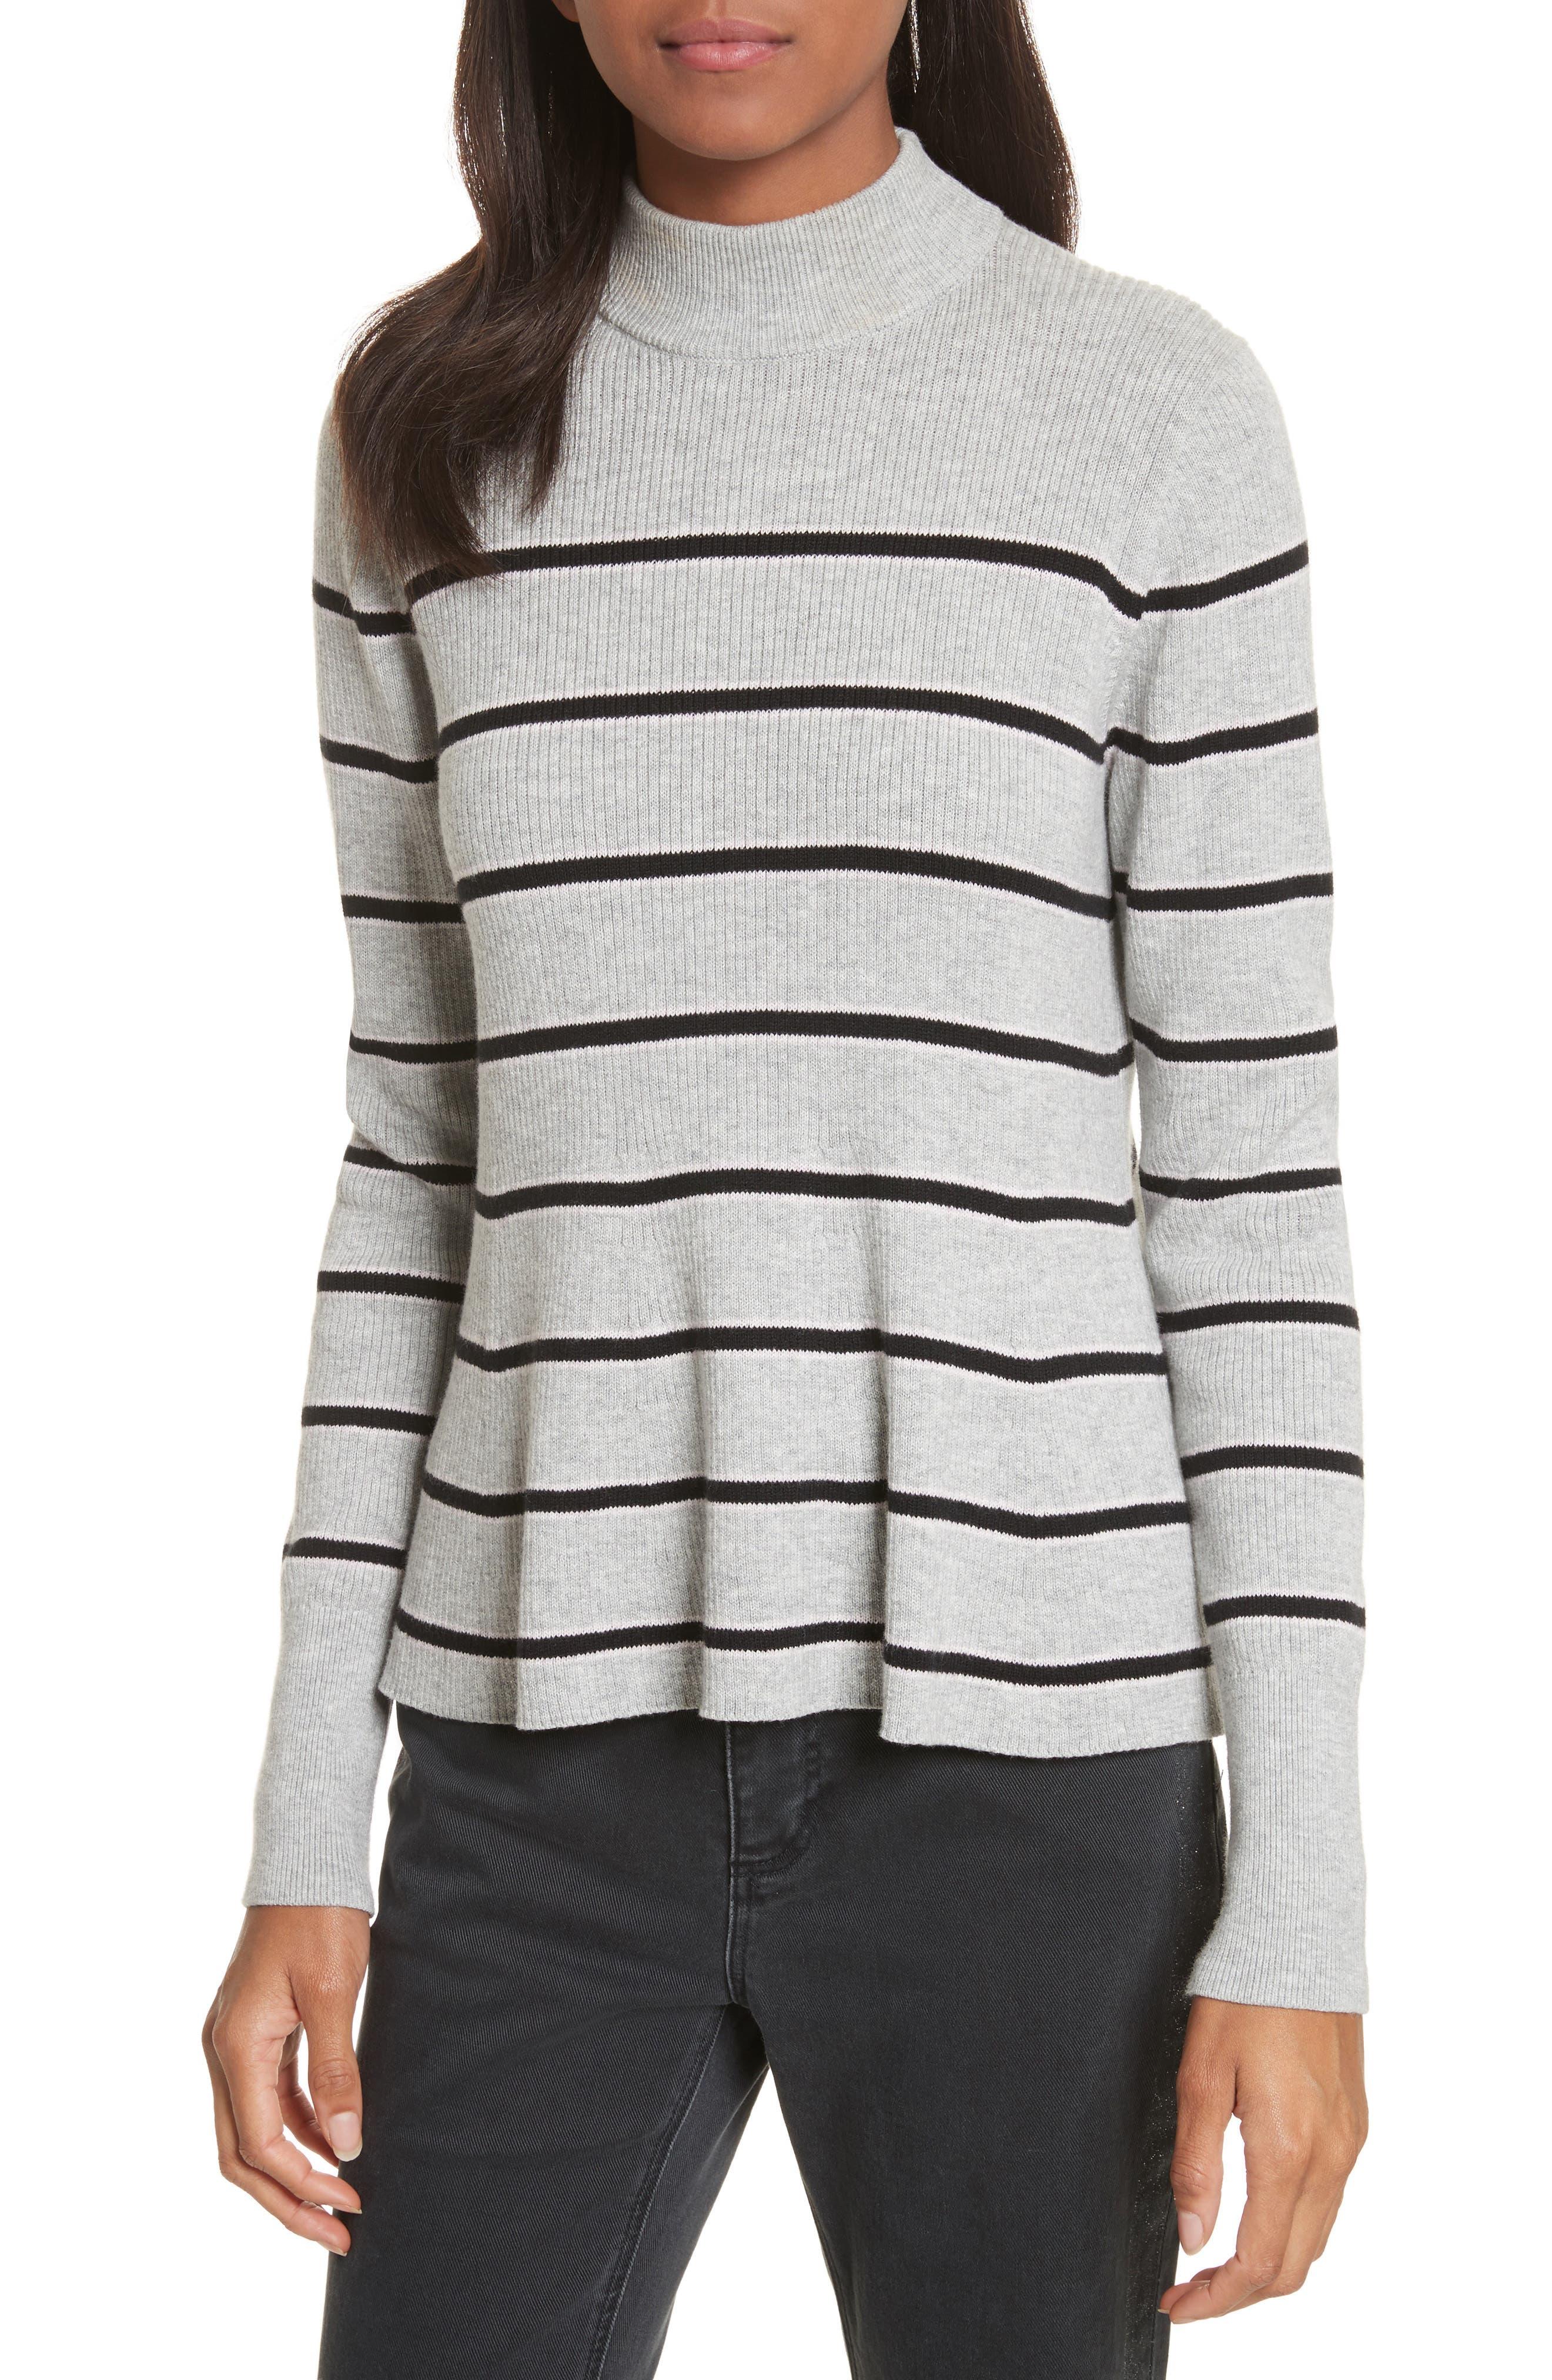 Alternate Image 1 Selected - La Vie Rebecca Taylor Mock Neck Stripe Pullover